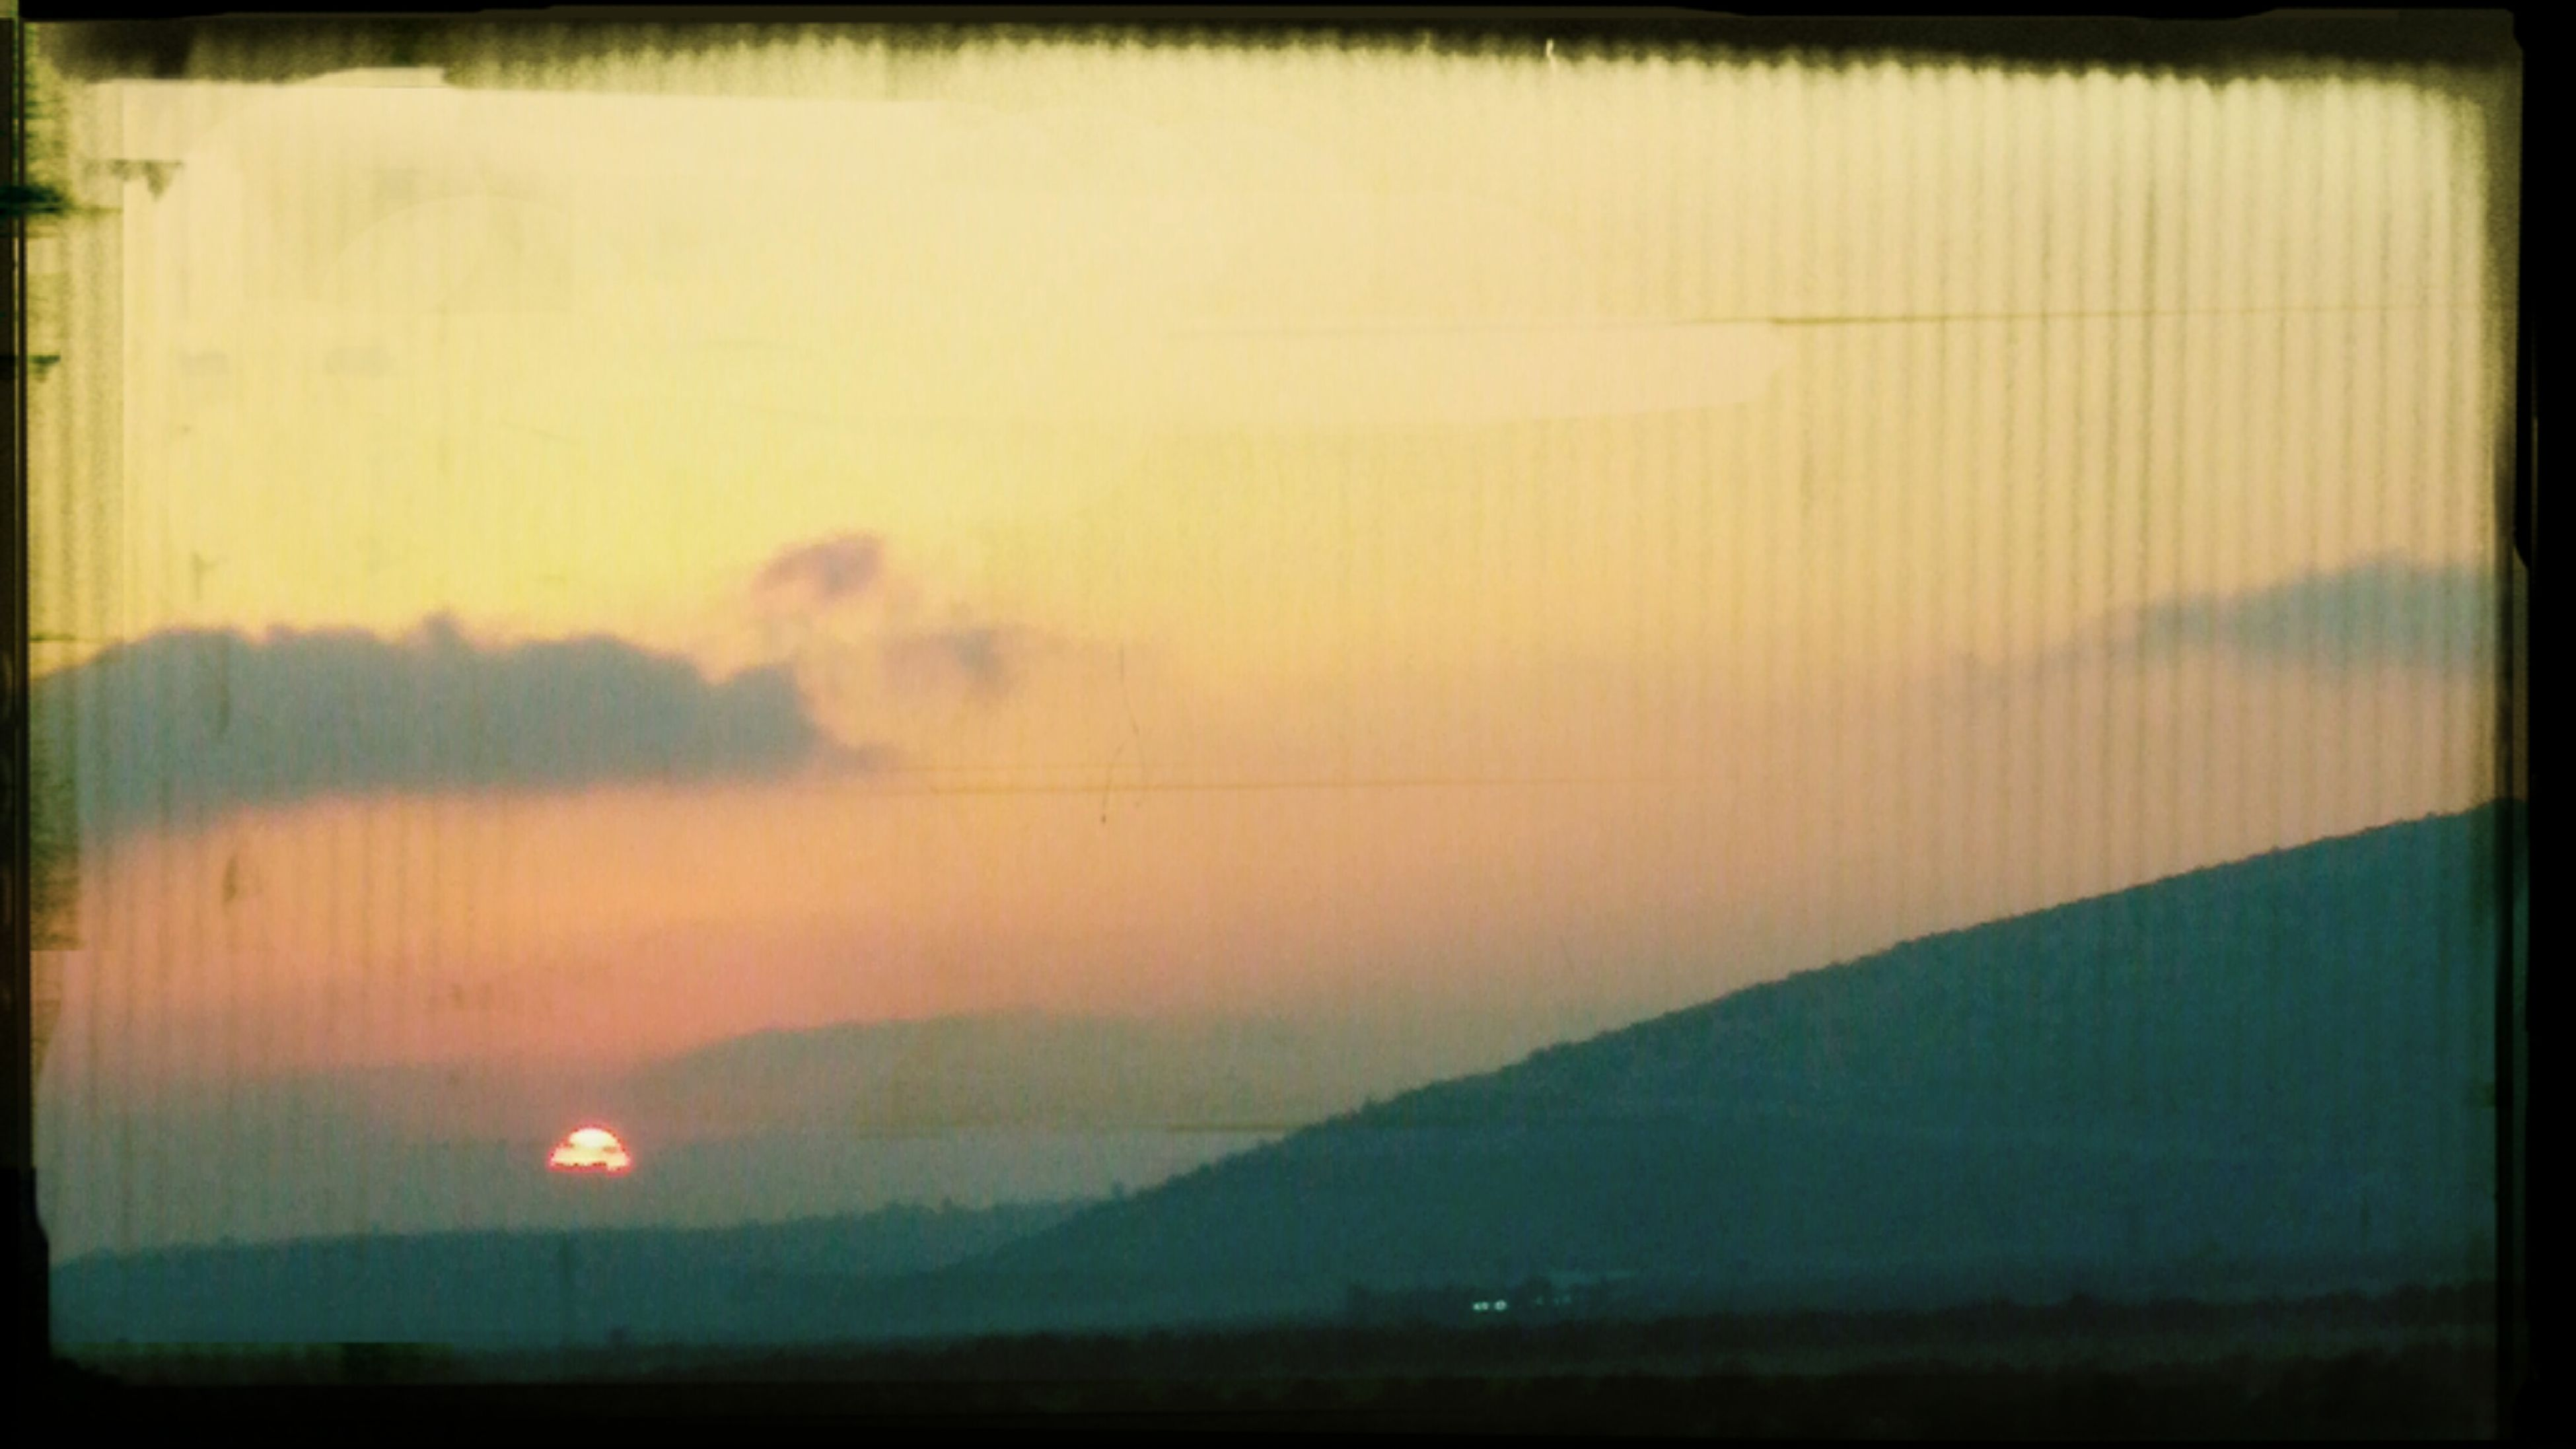 transfer print, sunset, auto post production filter, scenics, tranquil scene, sky, tranquility, silhouette, beauty in nature, nature, dusk, landscape, idyllic, cloud - sky, mountain, orange color, dark, outdoors, sun, weather